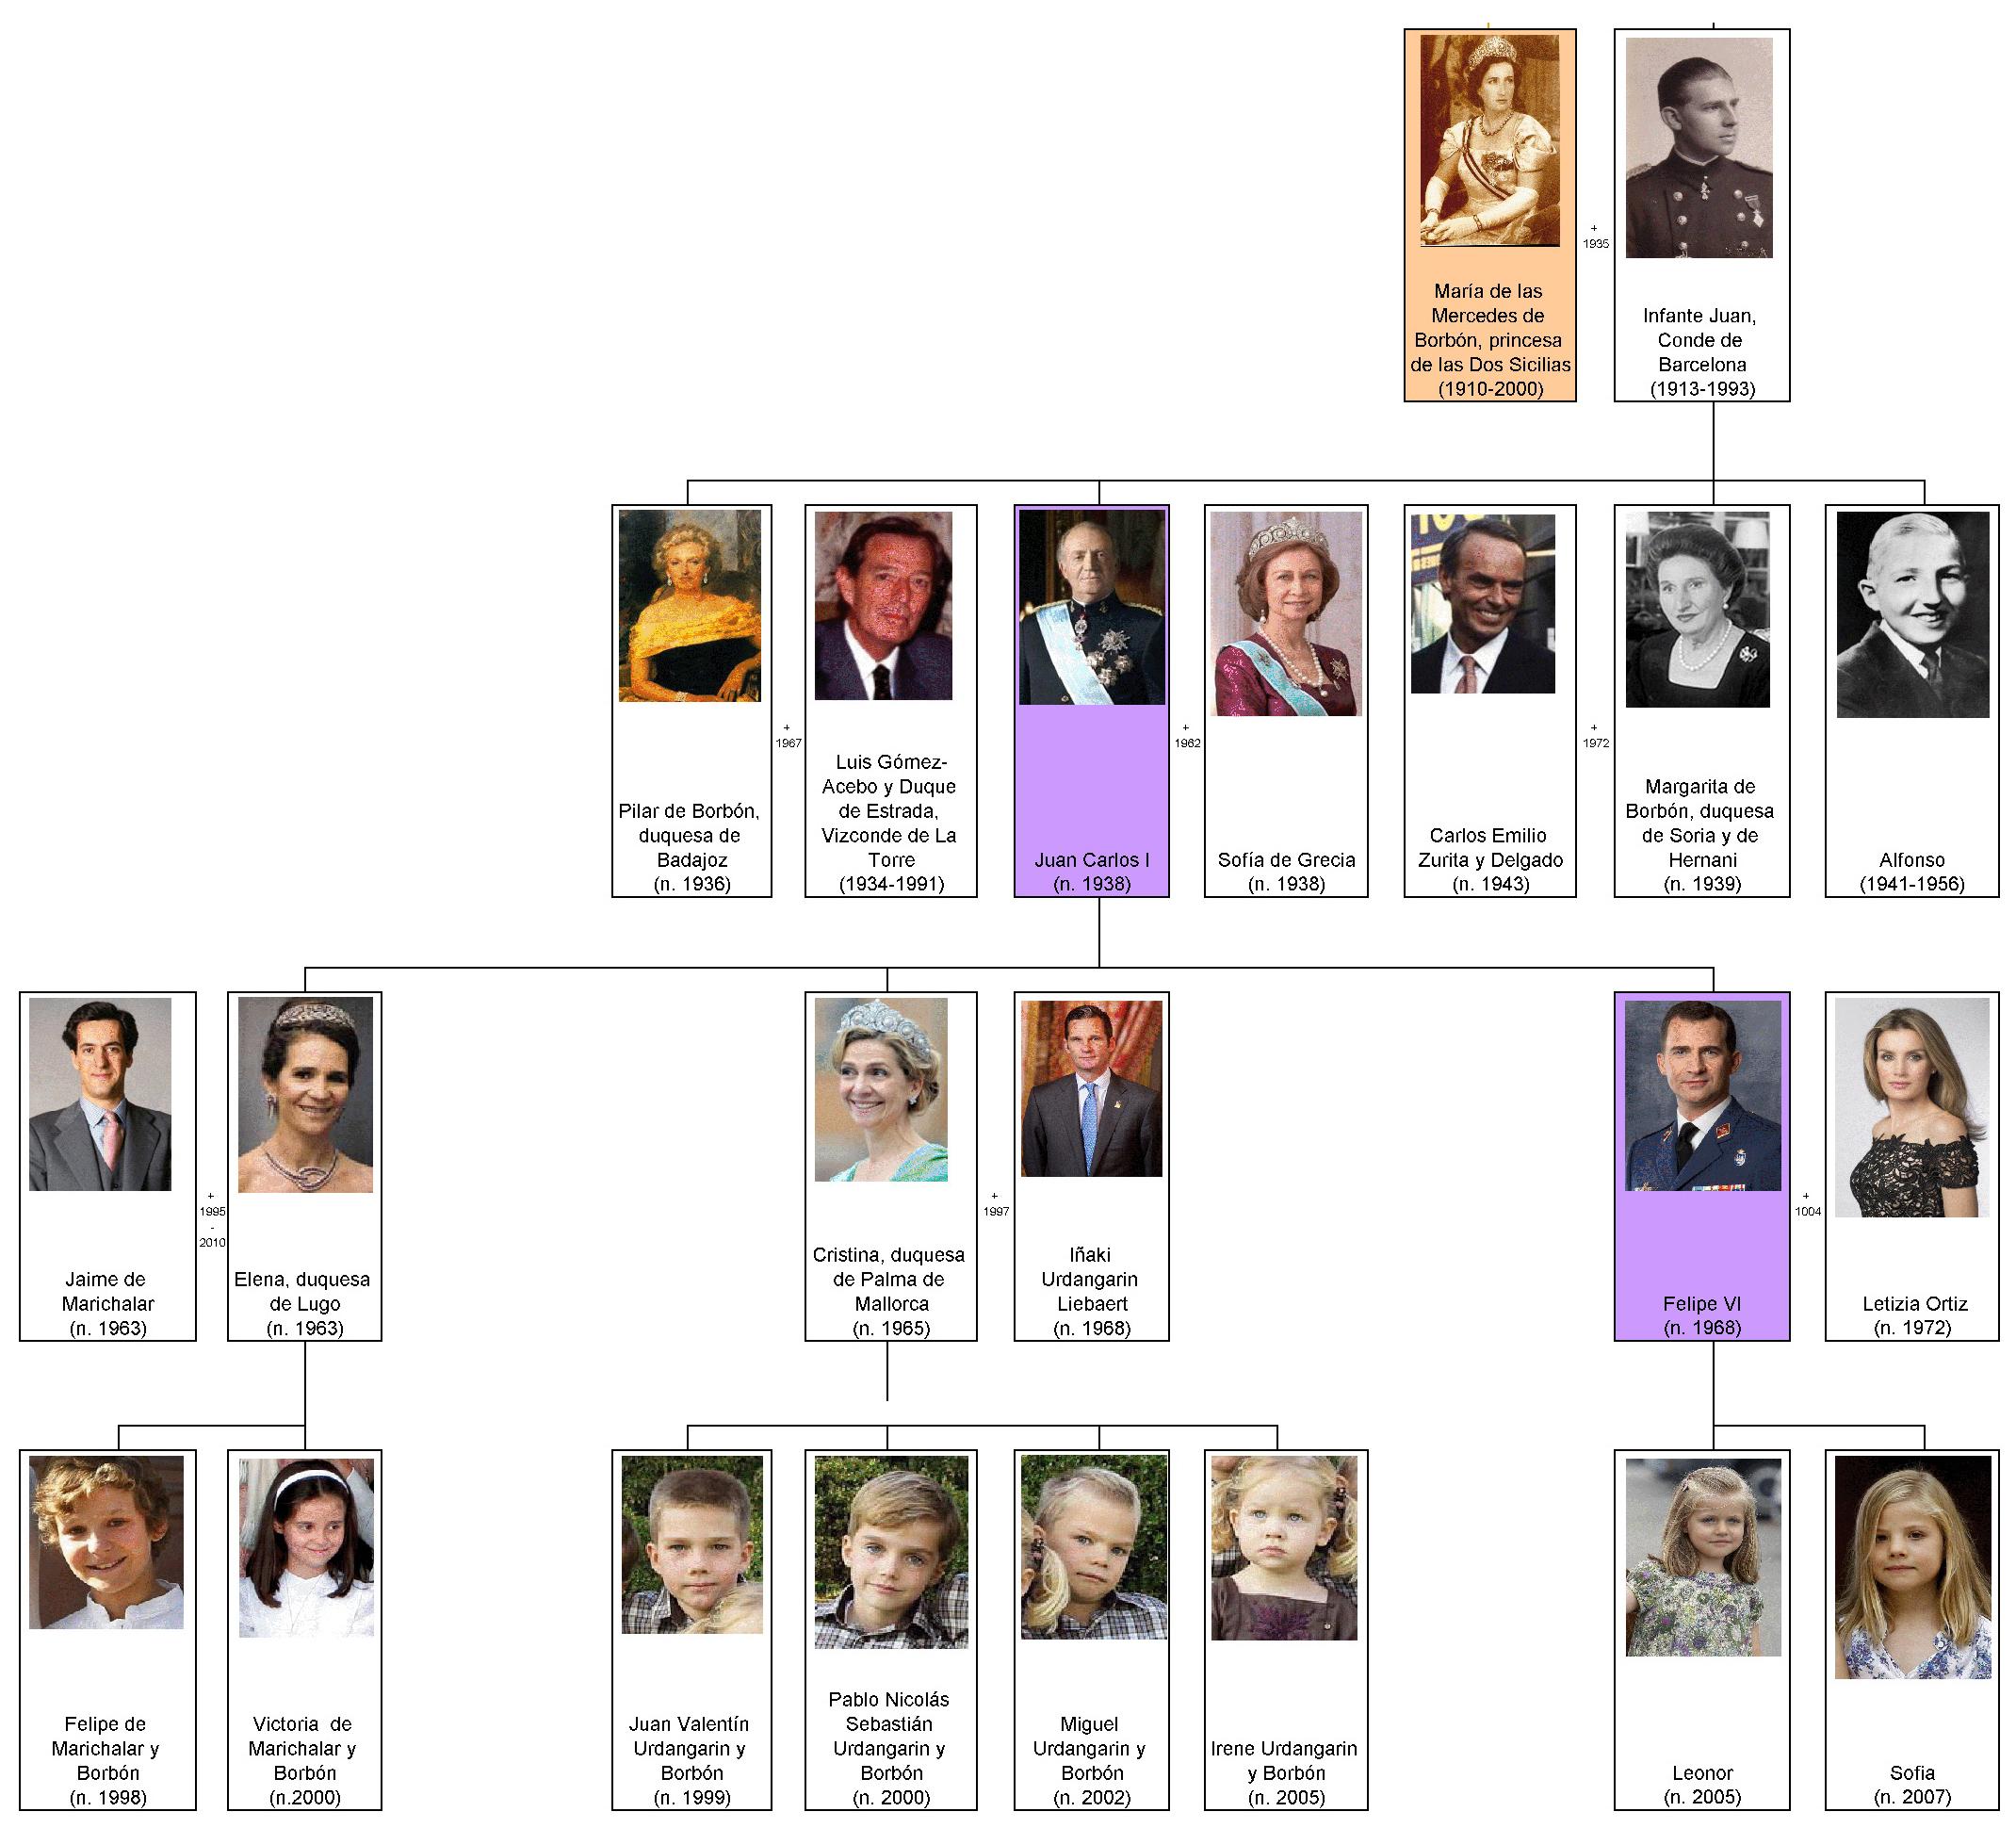 20 Generation Pedigree Chart: Dinasty Bourbon (Spain 20-21 century) family tree by shakko ,Chart